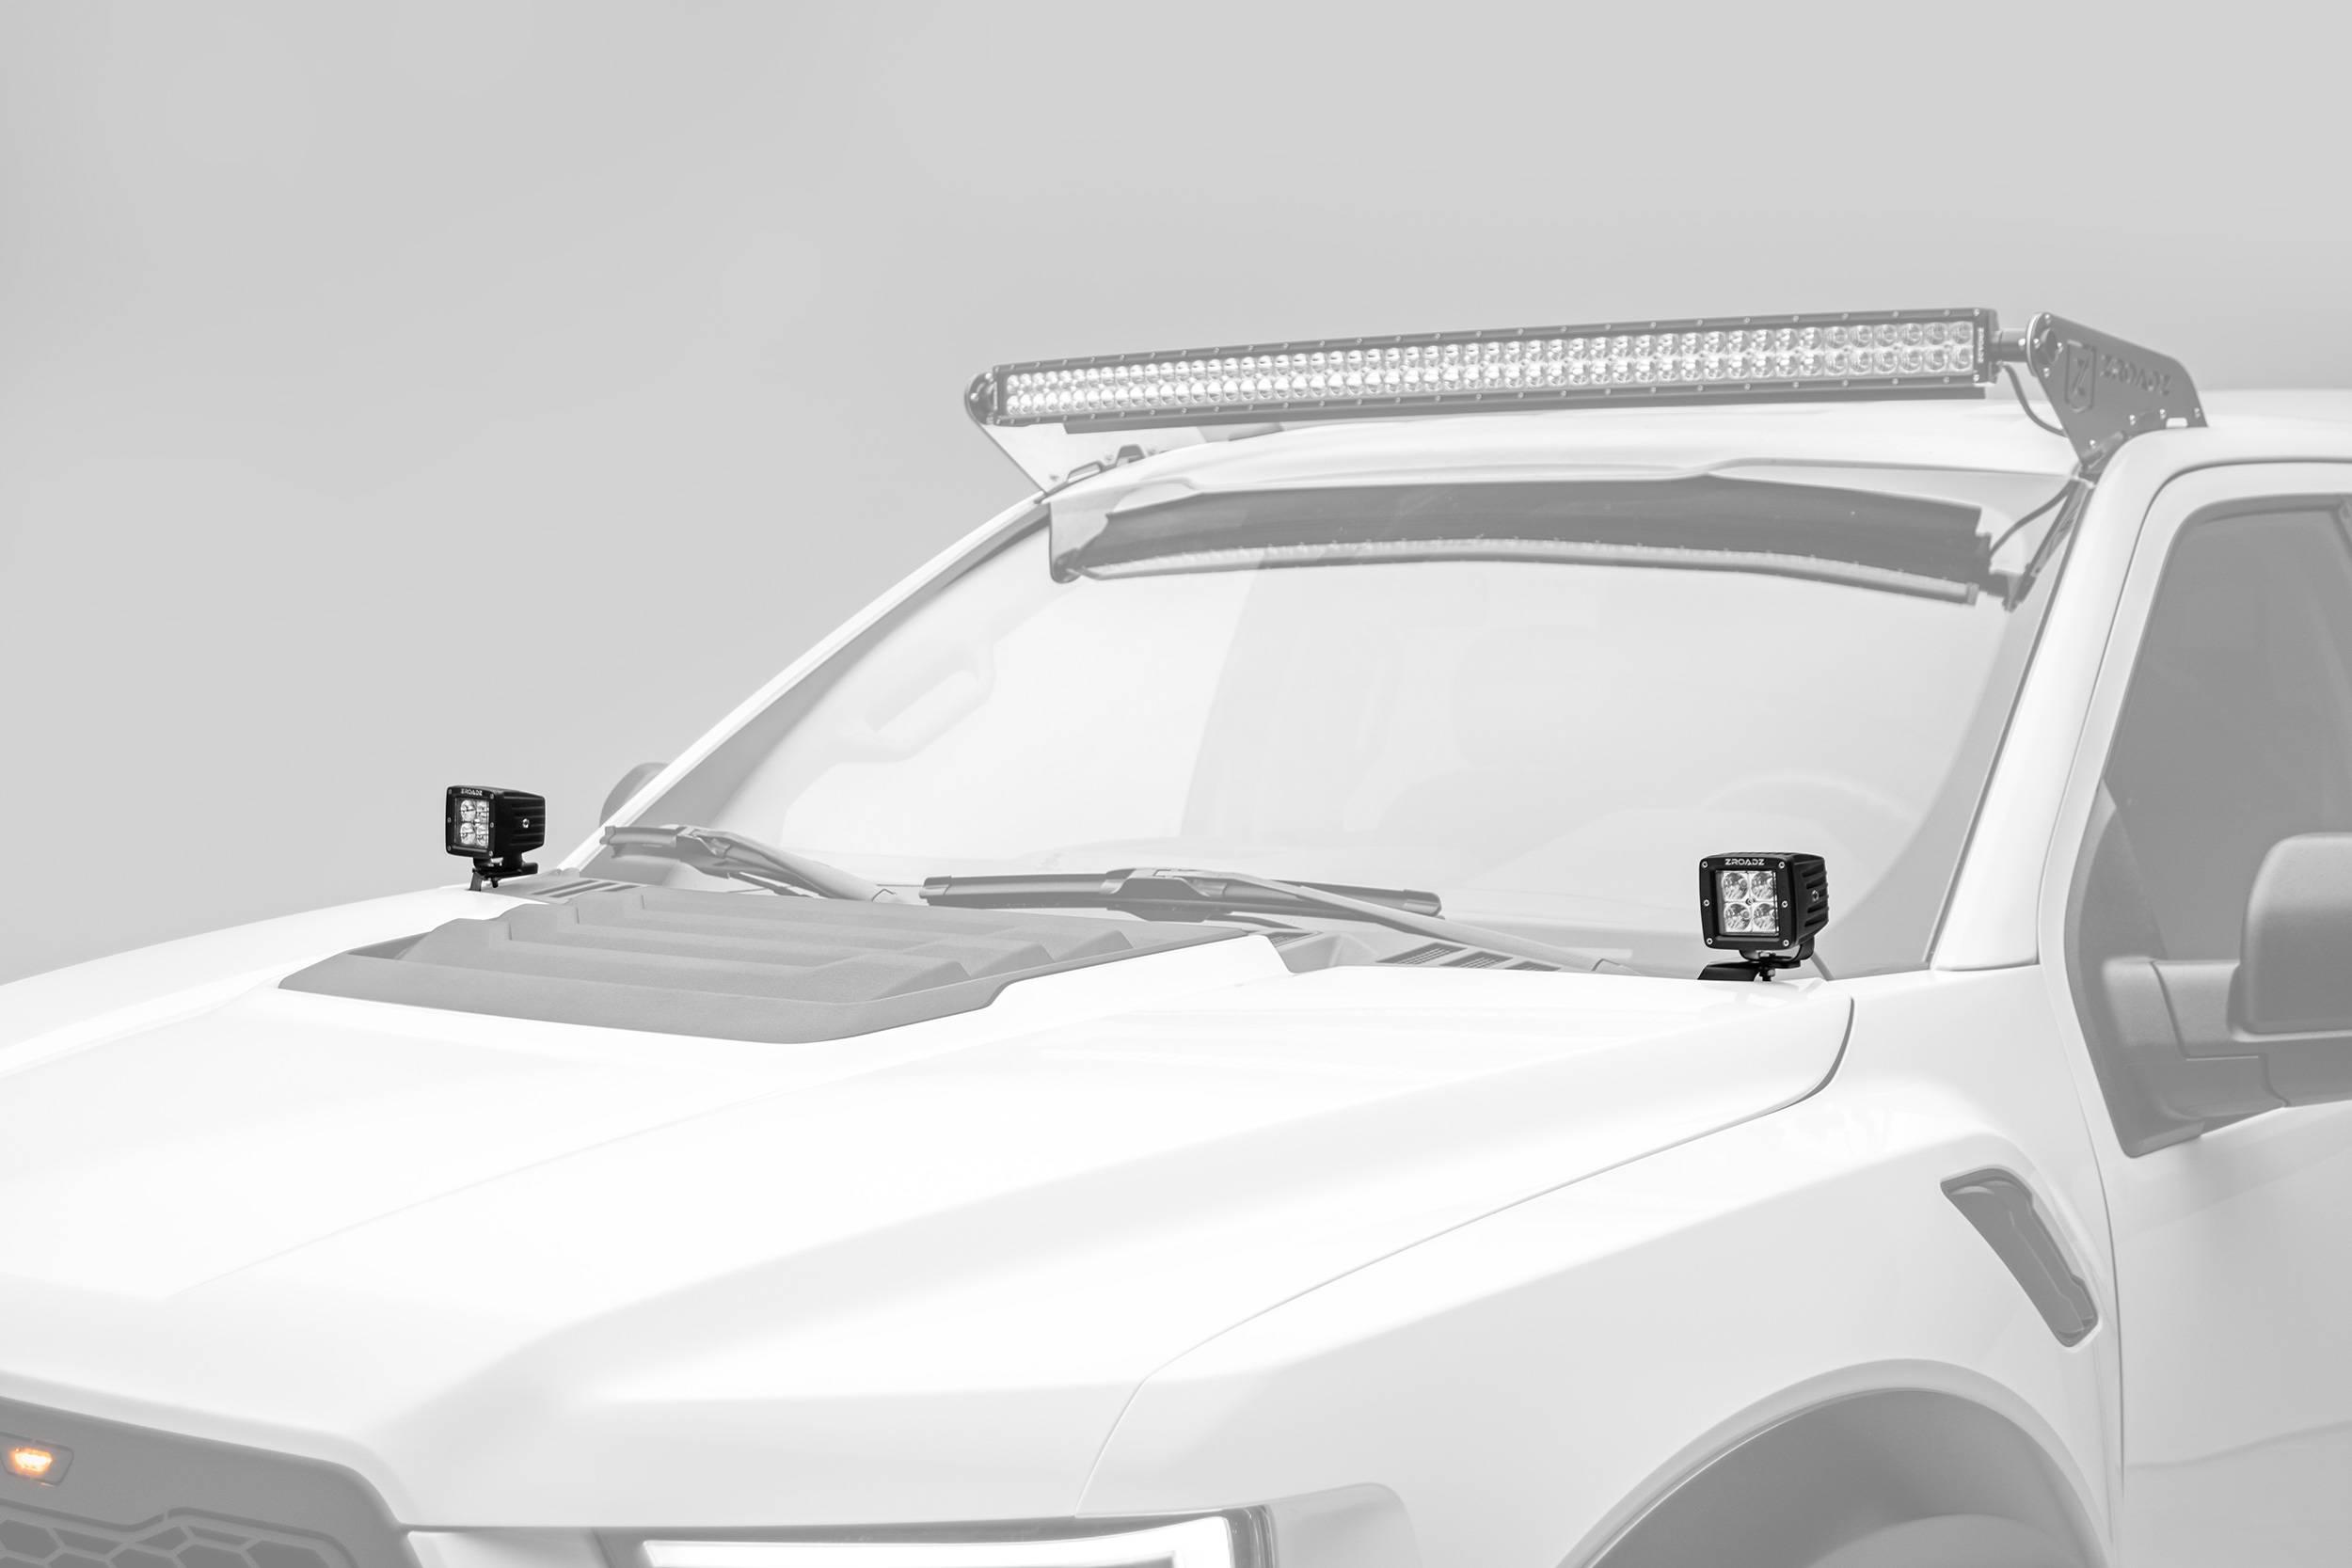 ZROADZ                                             - 2017-2019 Ford F-150 Raptor Hood Hinge LED Bracket to mount (2) 3 Inch LED Pod Lights - PN #Z365701